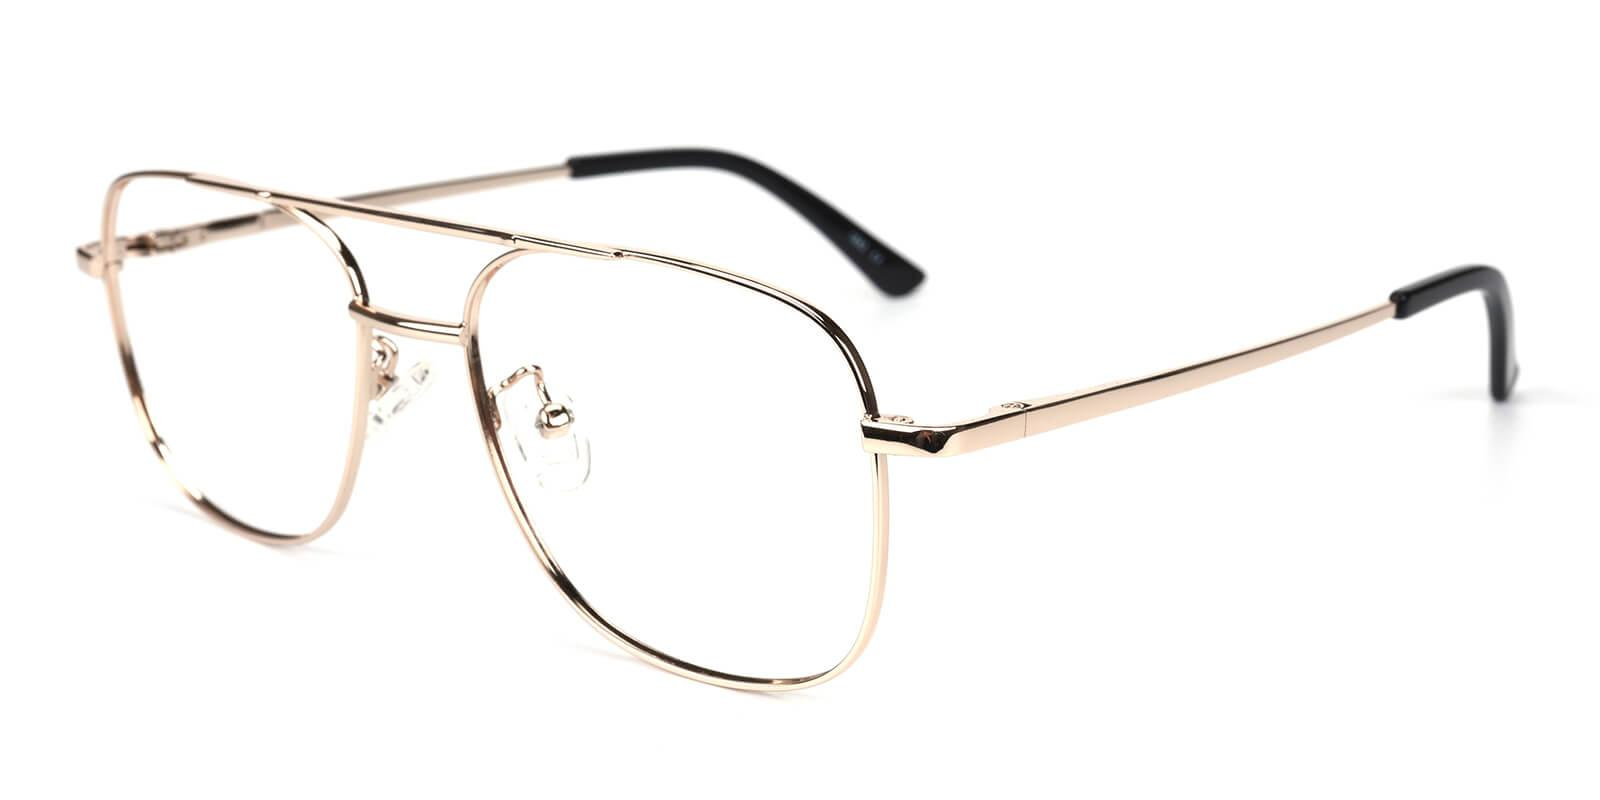 Sally-Gold-Aviator-Metal-Eyeglasses-additional1